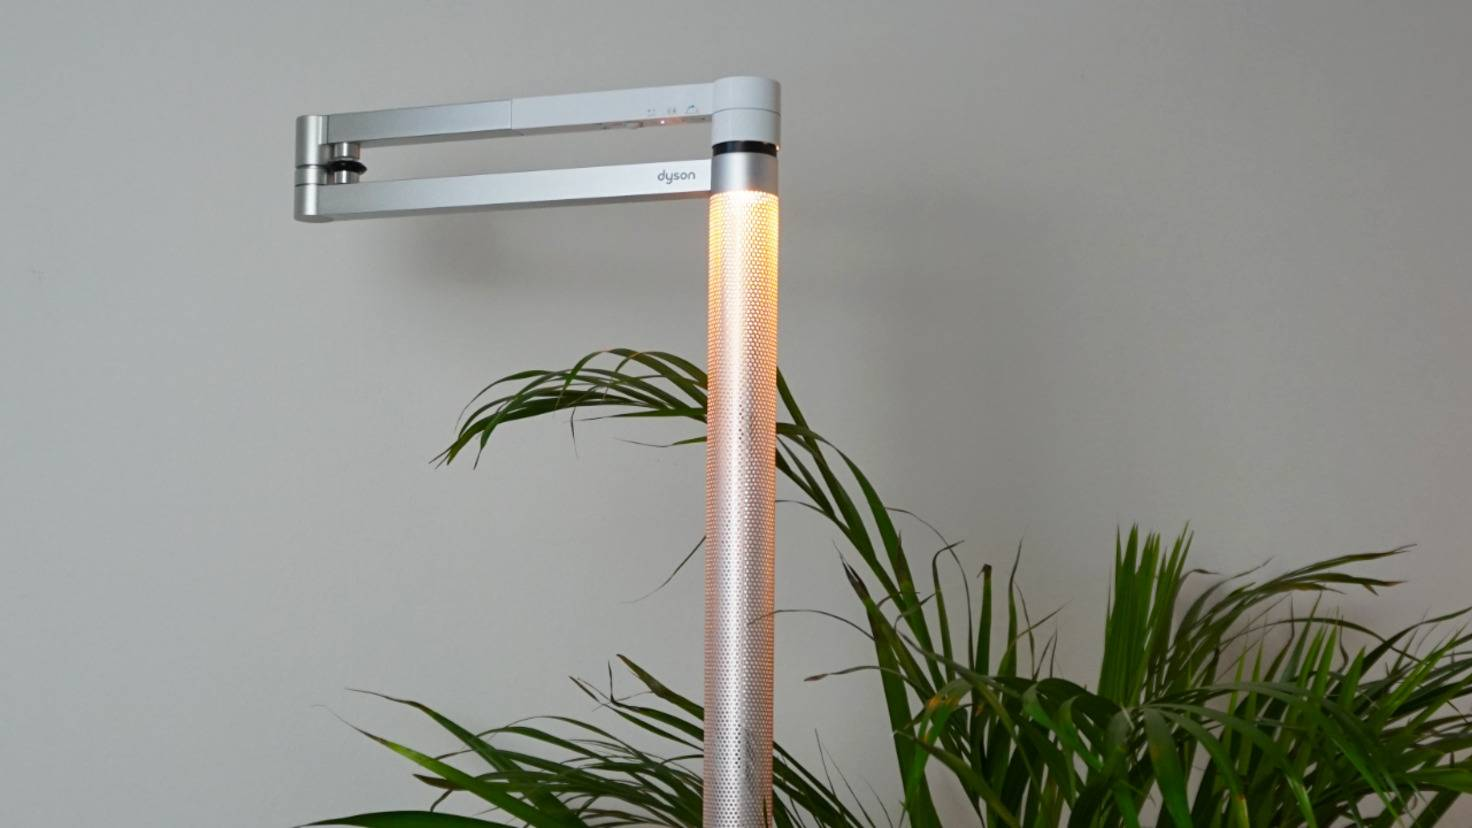 Dyson Lightcycle Morph mit pflanze